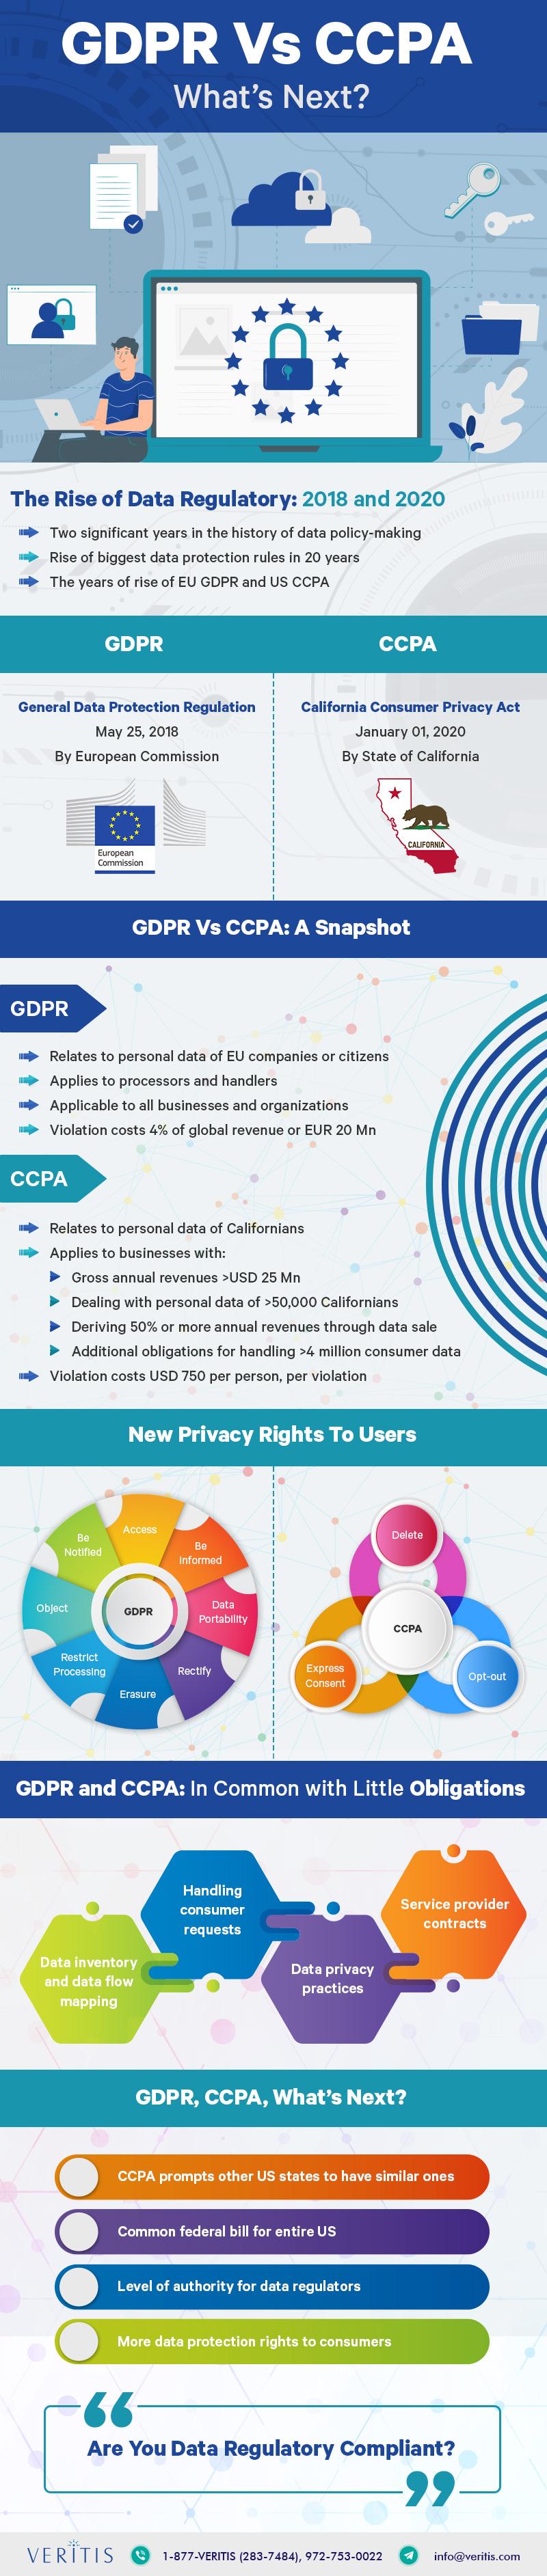 Data Regulatory: GDPR Vs CCPA, What's Next? #infographic